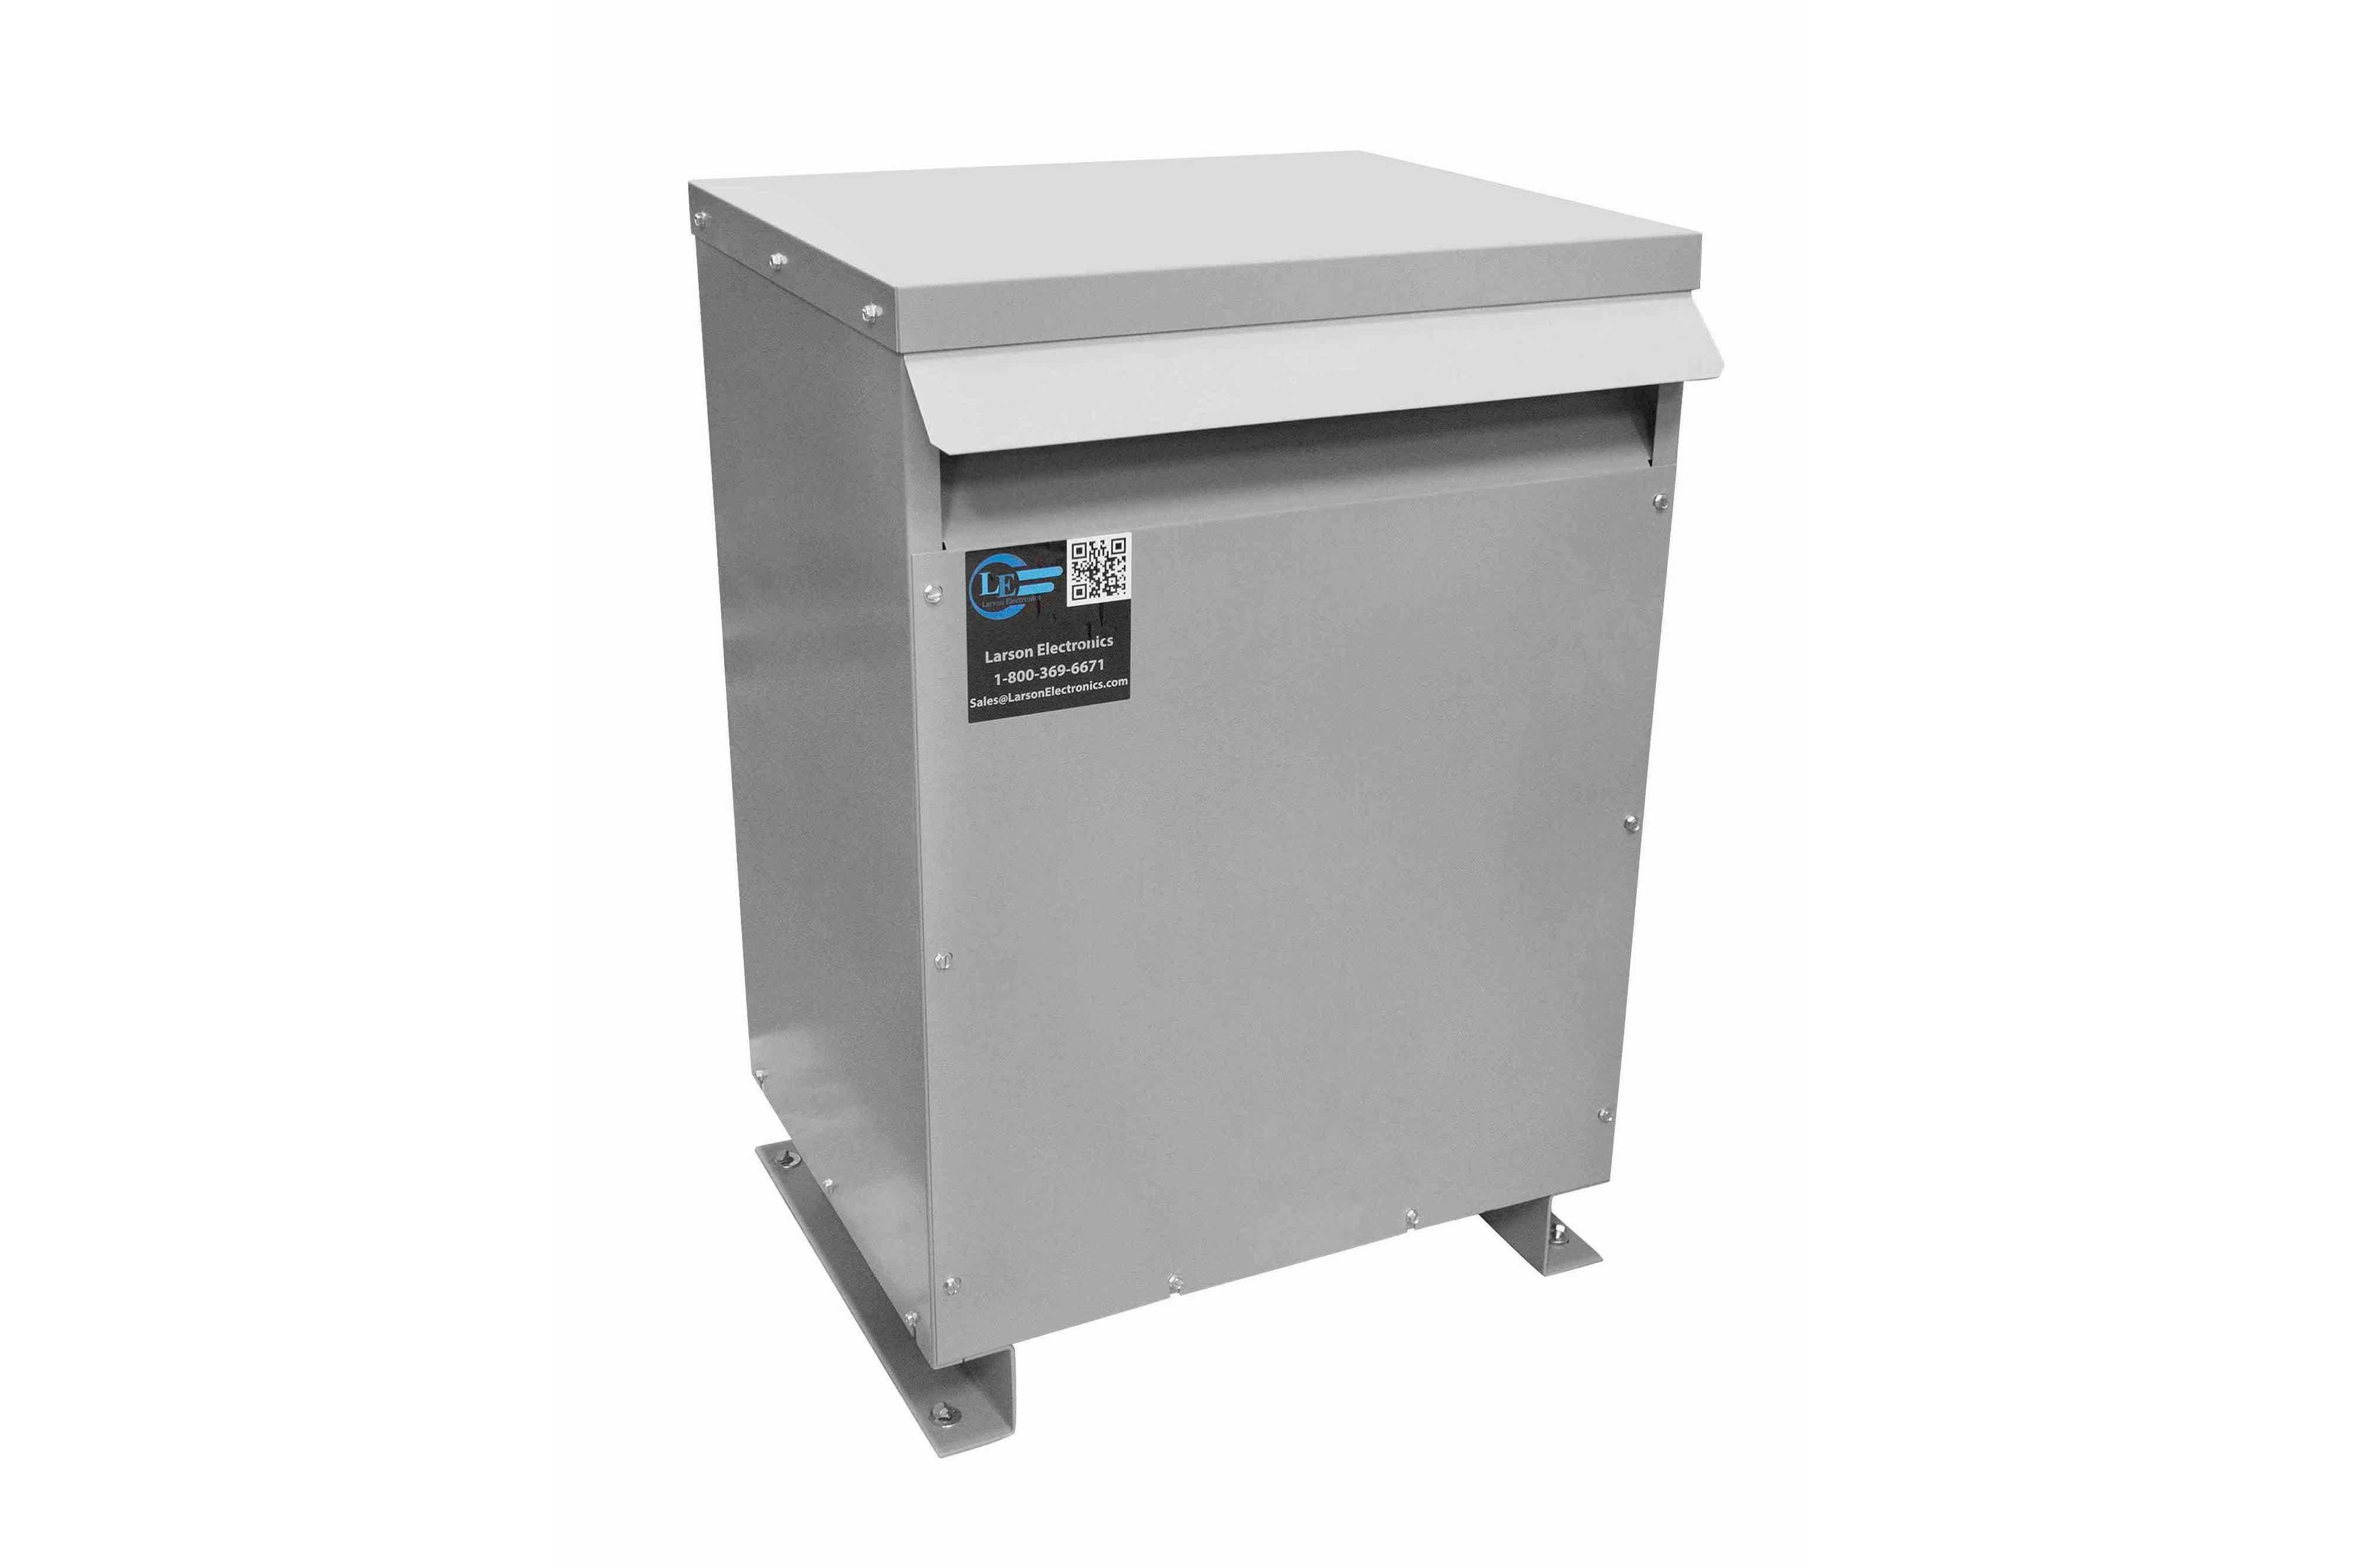 137.5 kVA 3PH Isolation Transformer, 240V Wye Primary, 380V Delta Secondary, N3R, Ventilated, 60 Hz